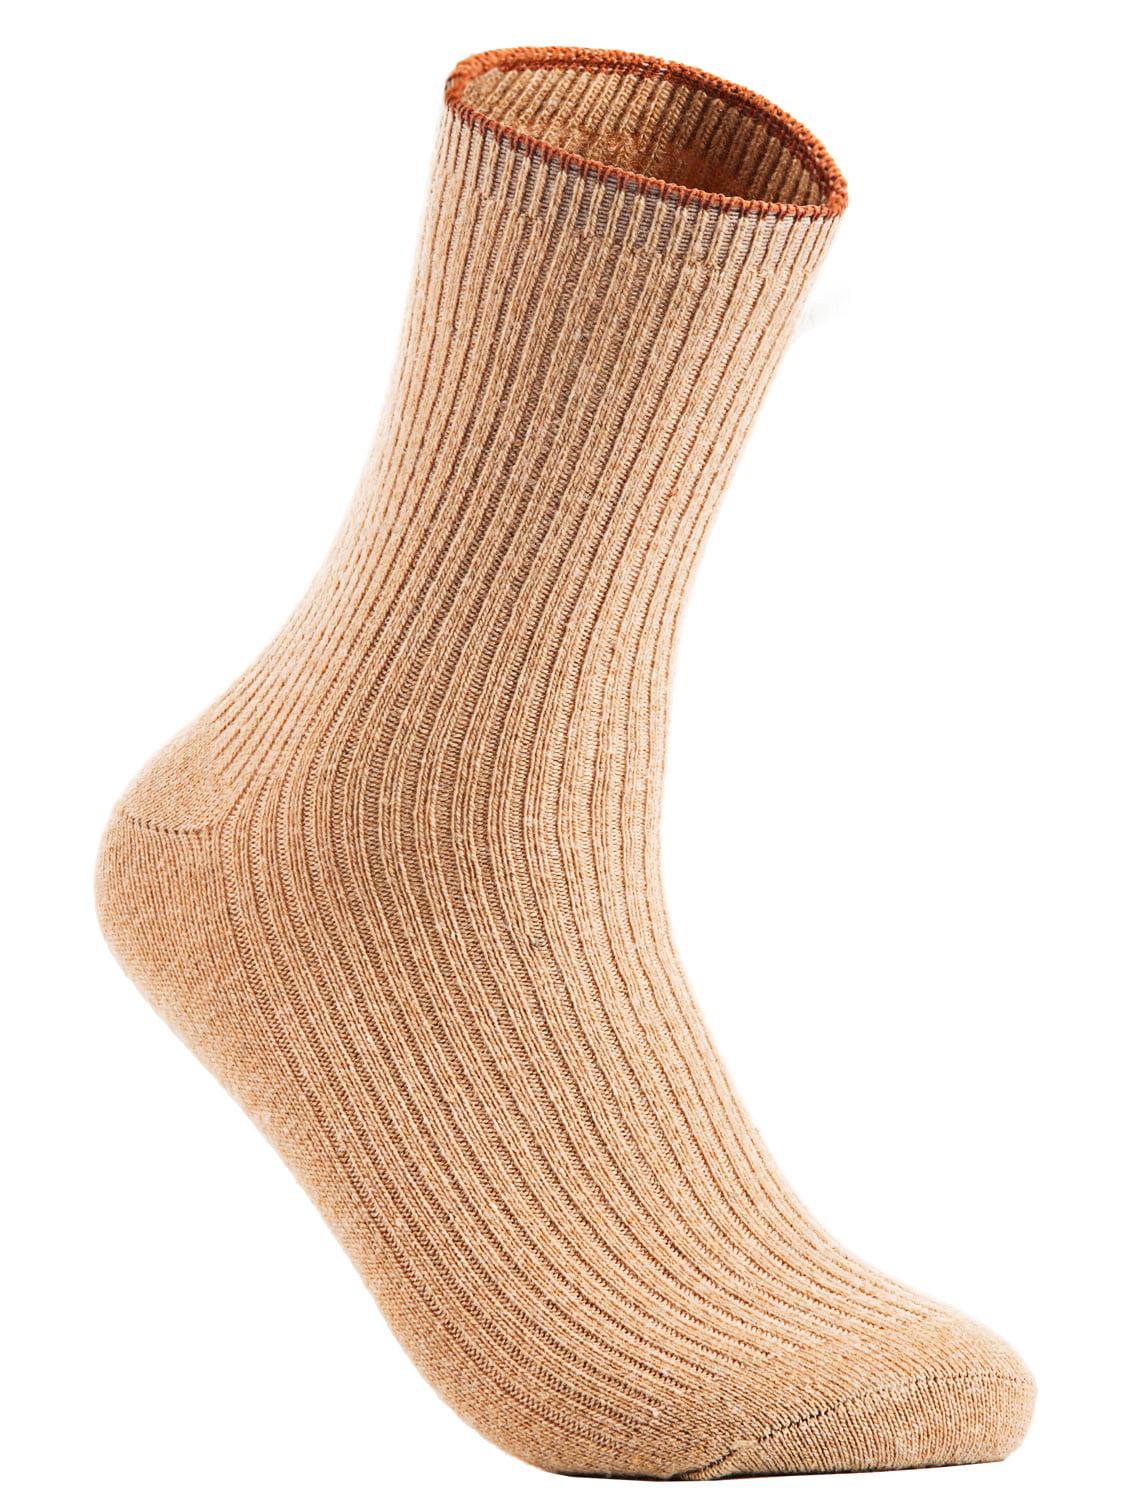 Lian LifeStyle Big Girl's 4 Pairs Wool Crew Socks HR1612 Size L/XL Casual (Beige)